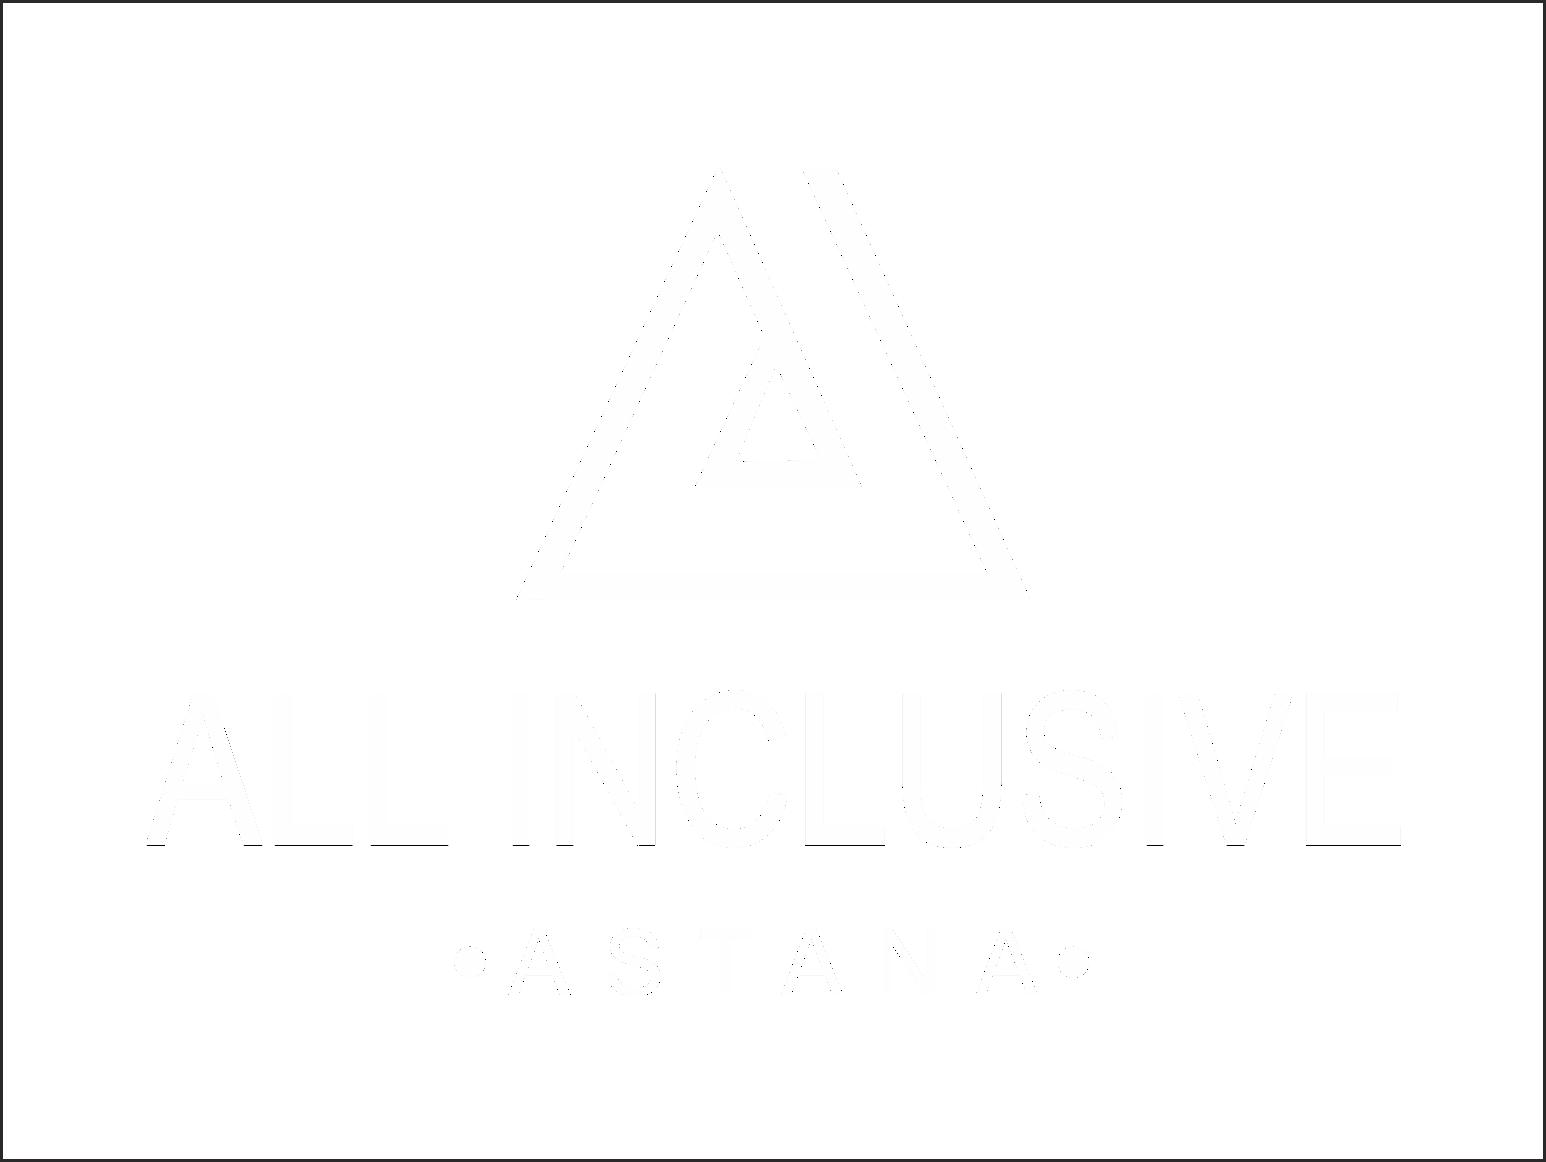 All Inclusive Astana